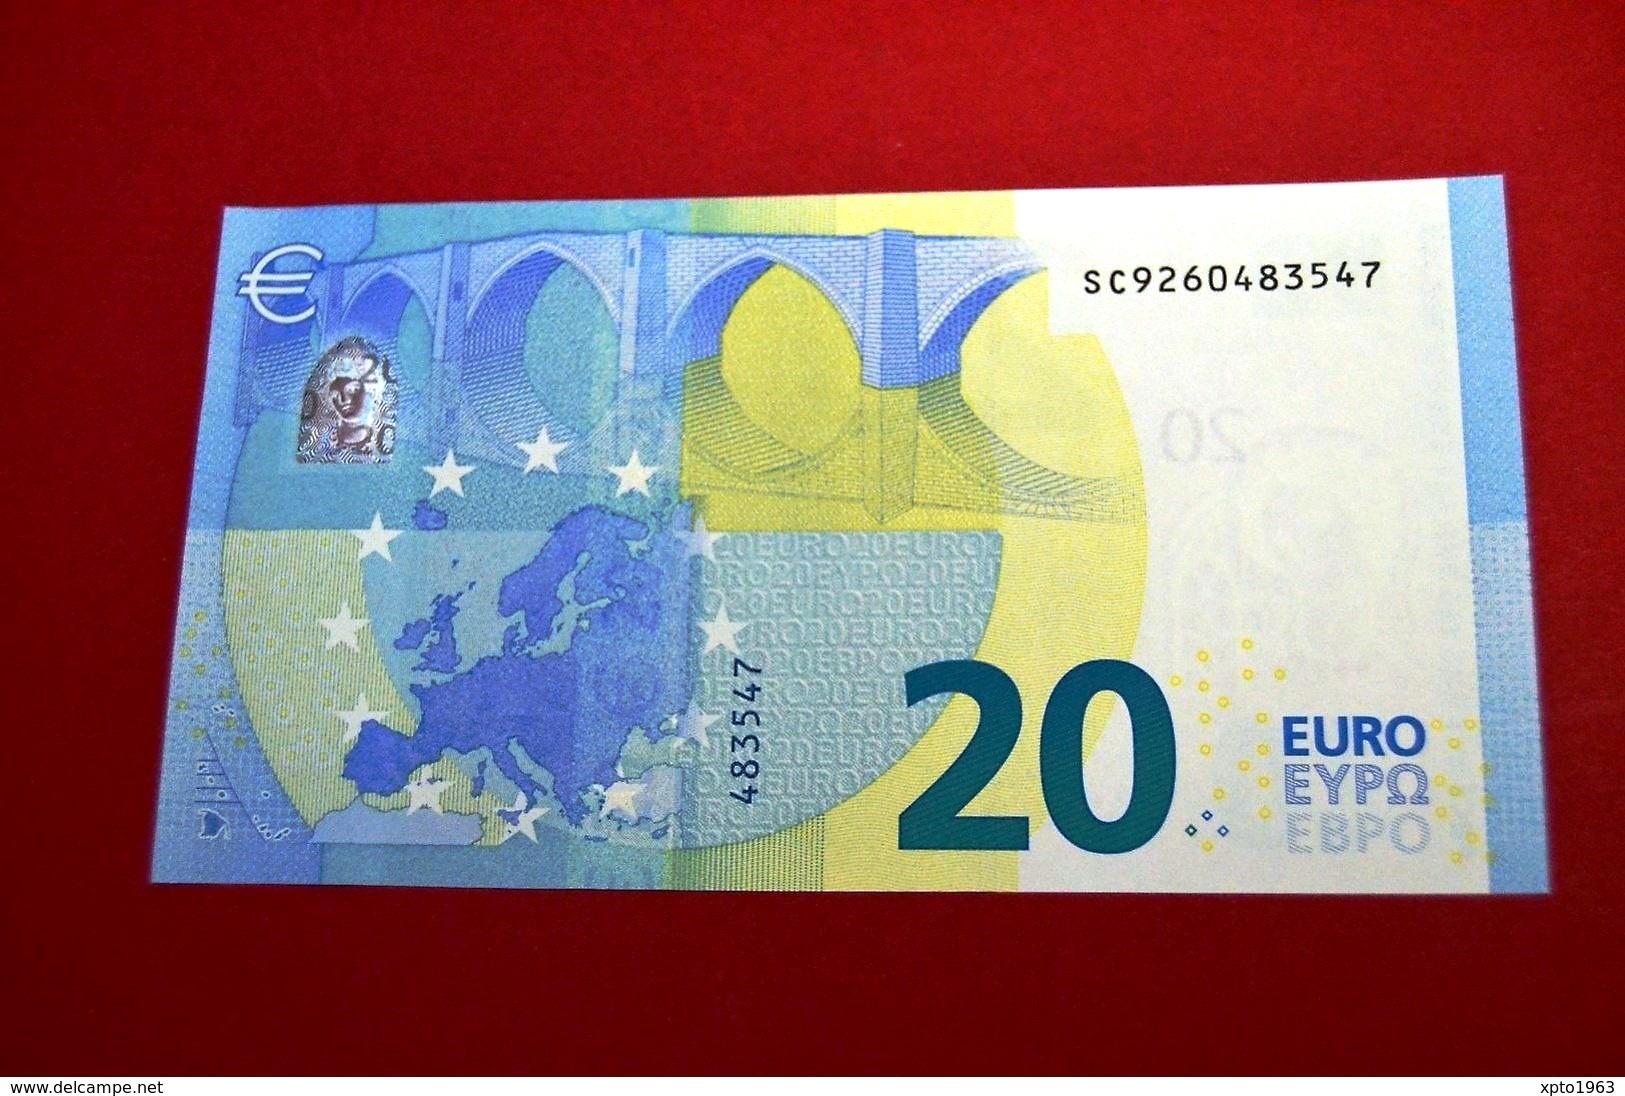 20 EURO ITALIA - S013 I4 - S013I4 - SC9260483547 - ITALY - UNC - FDS - NEUF - EURO